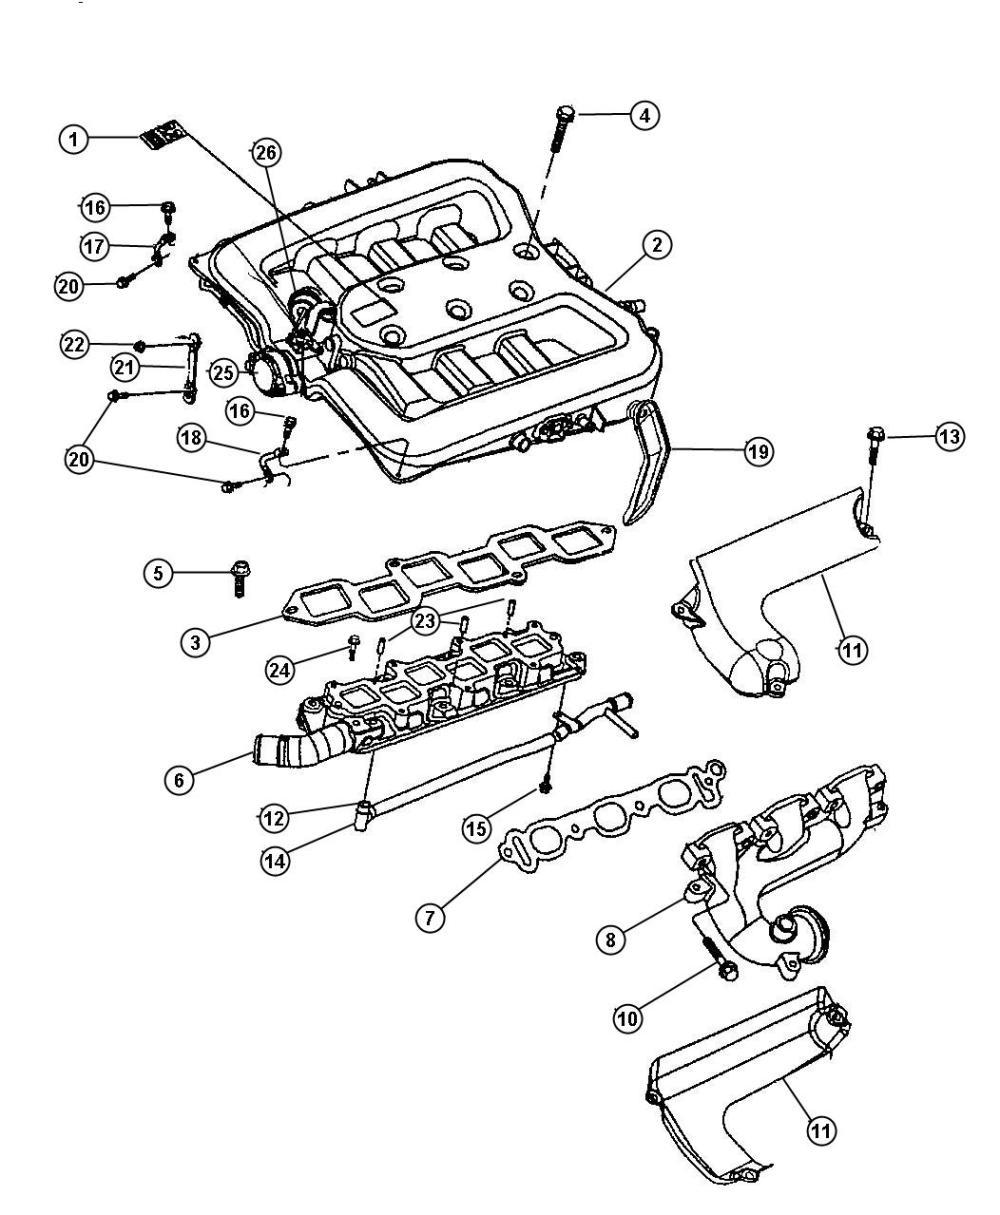 medium resolution of 2000 dodge intrepid factory radio wiring 2000 dodge dakota wiring diagram 2000 dodge dakota wiring diagram